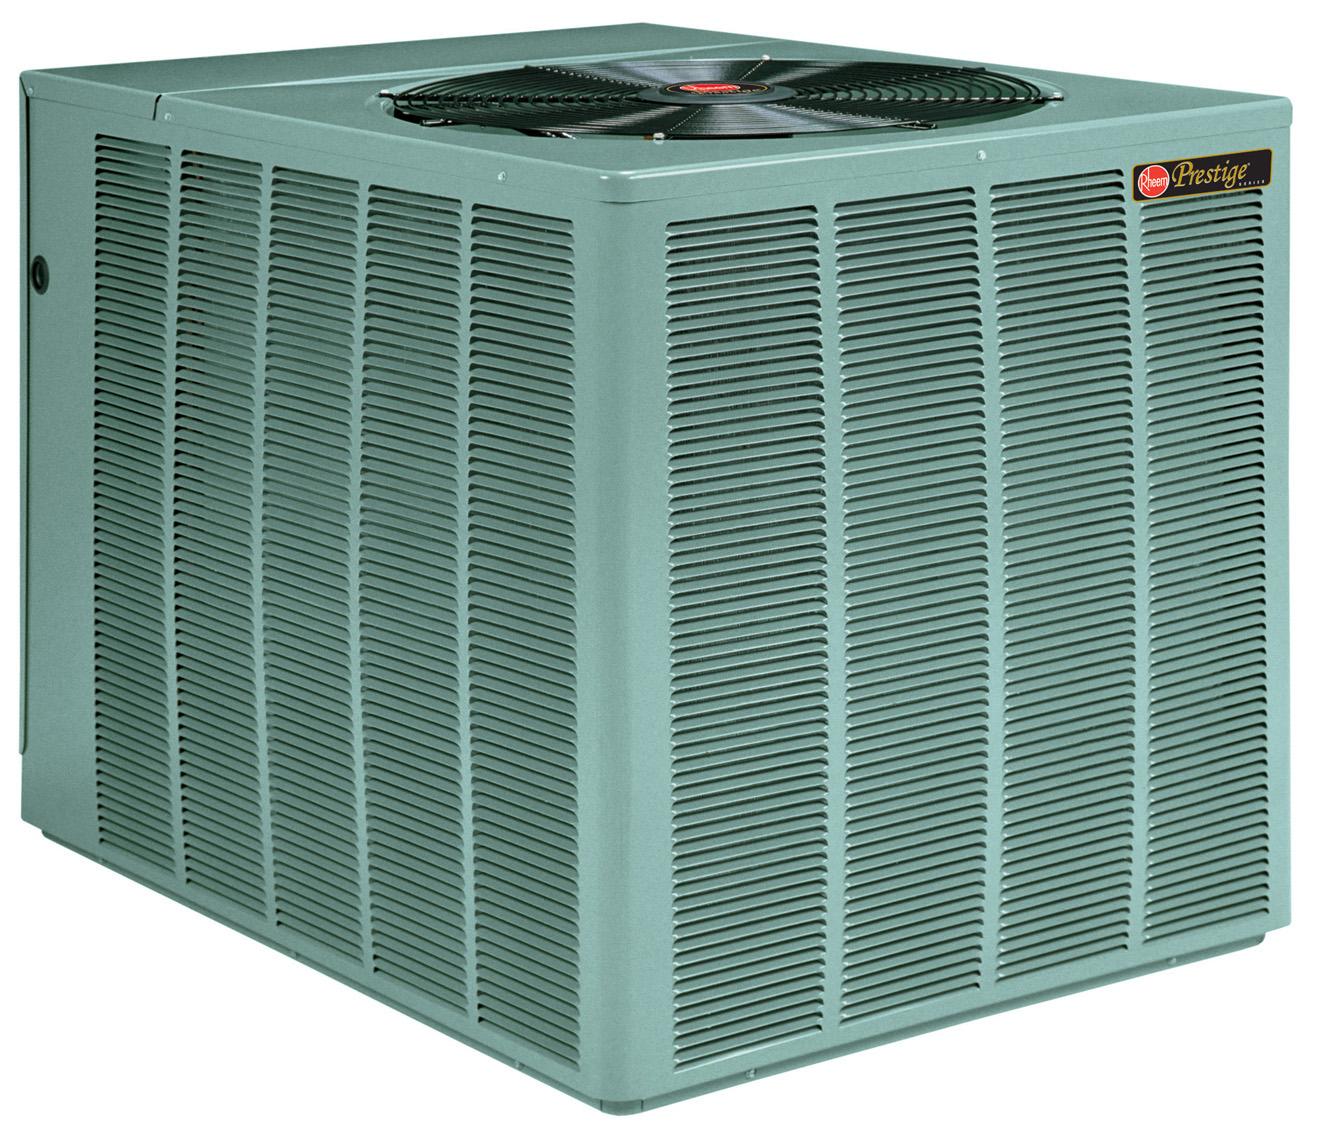 Rheem Prestige RASL-RARL-JEC Air Conditioner